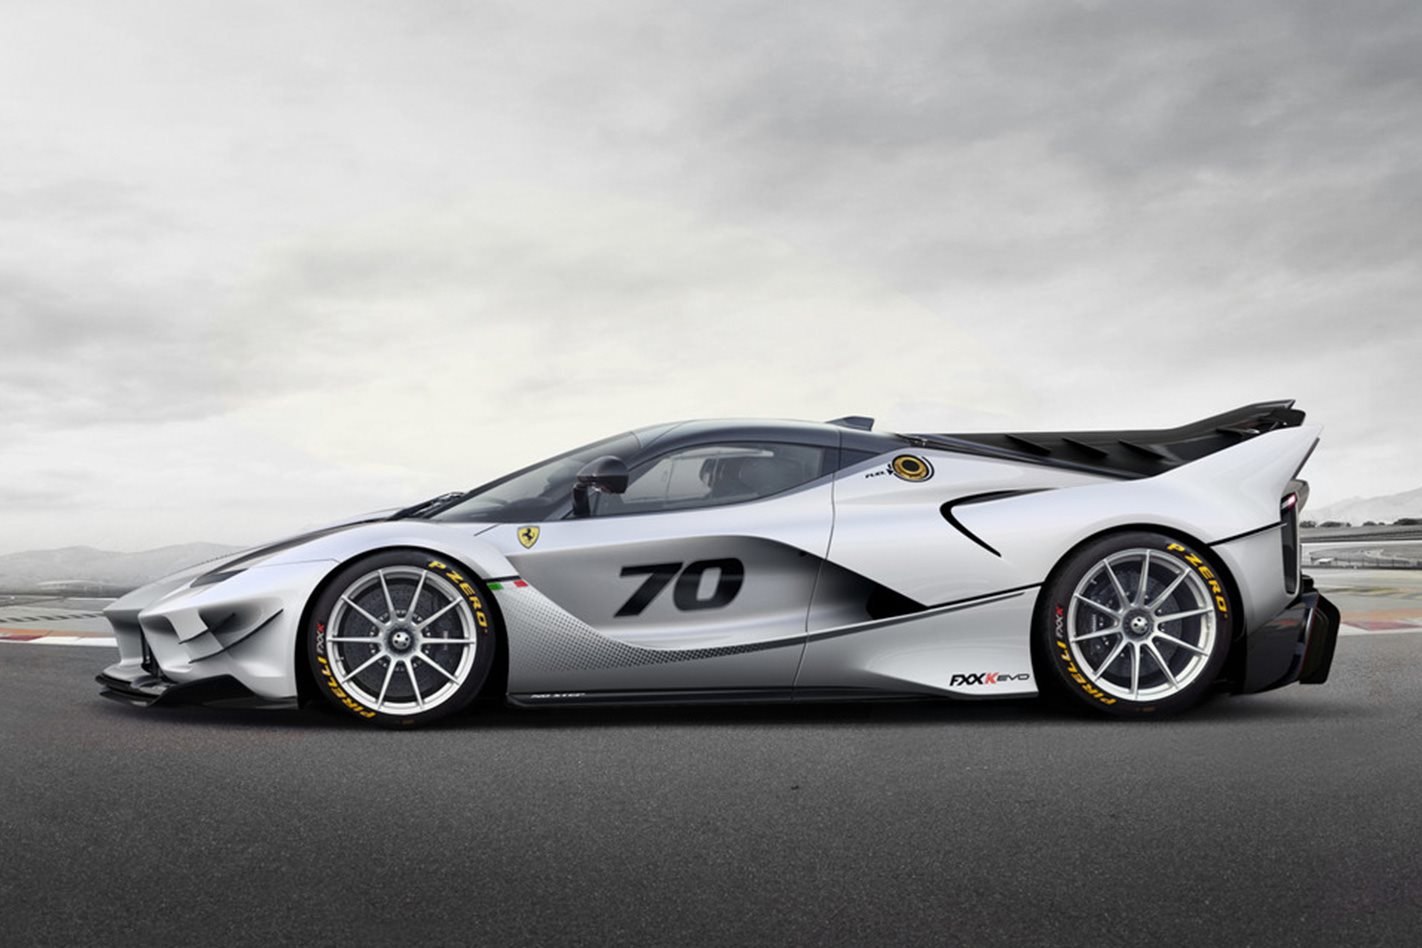 Ferrari-FXX-K-Evoluzione-side.jpg